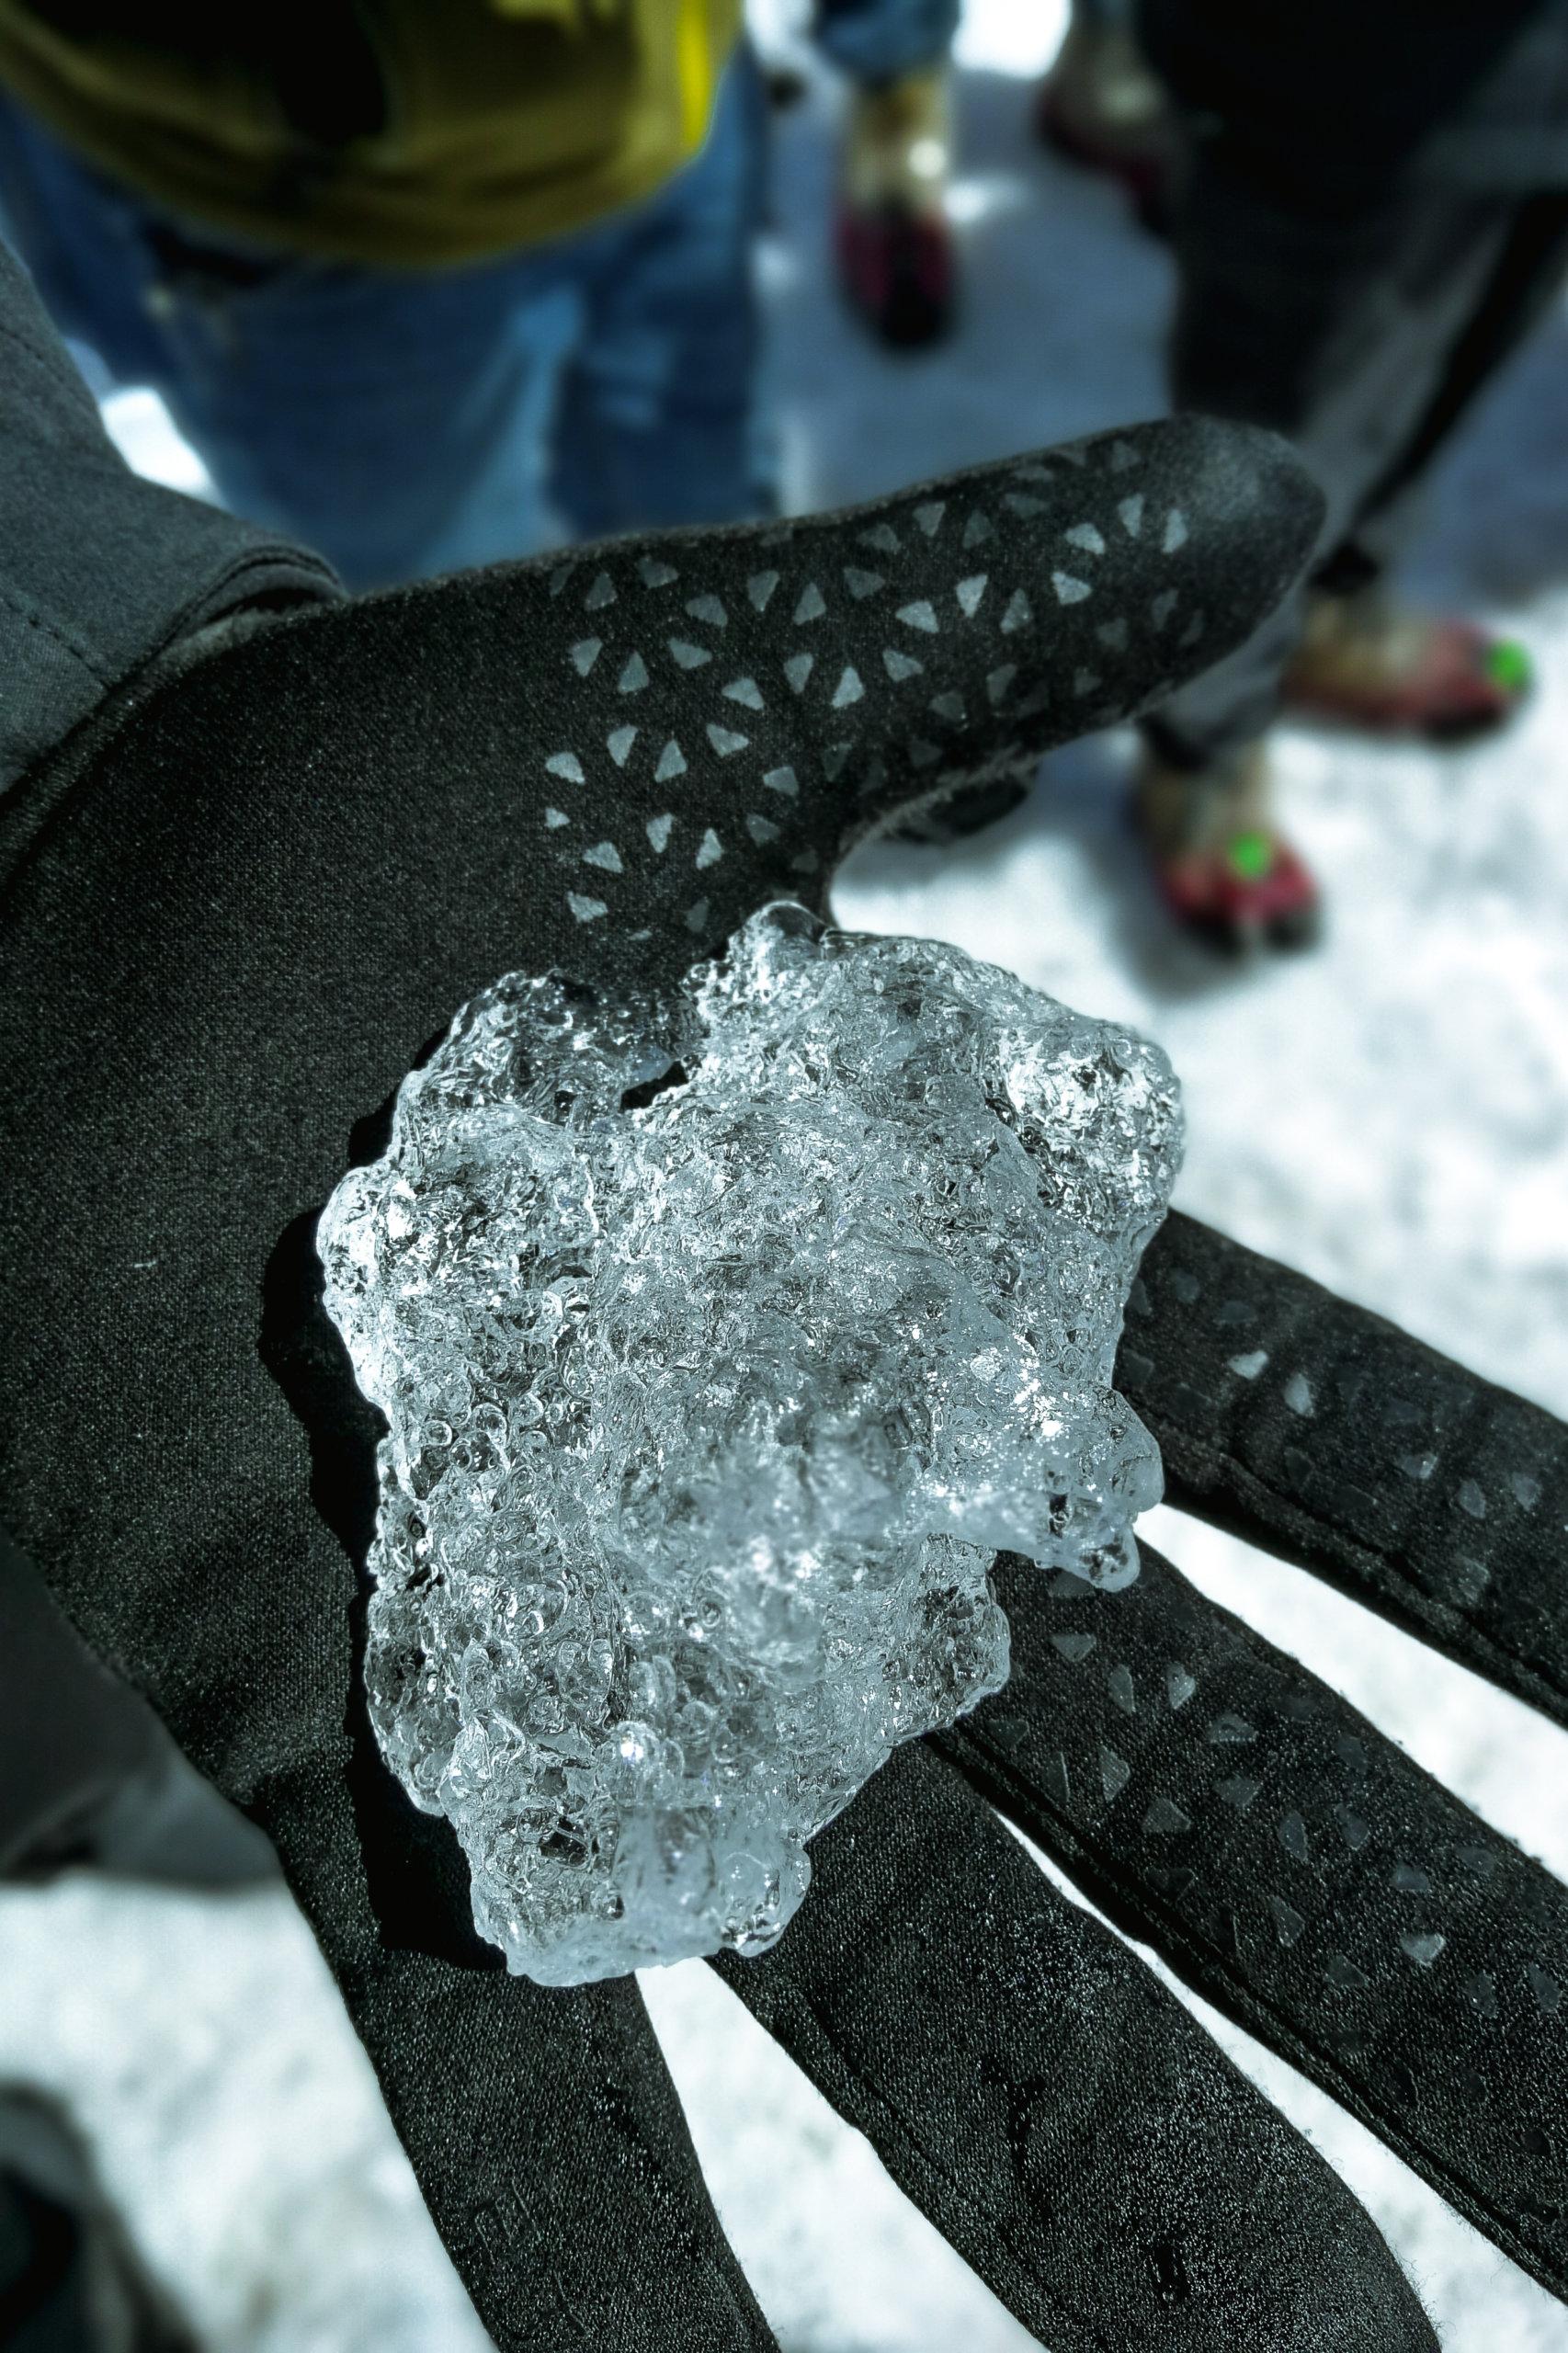 Tausend Jahre altes Eis